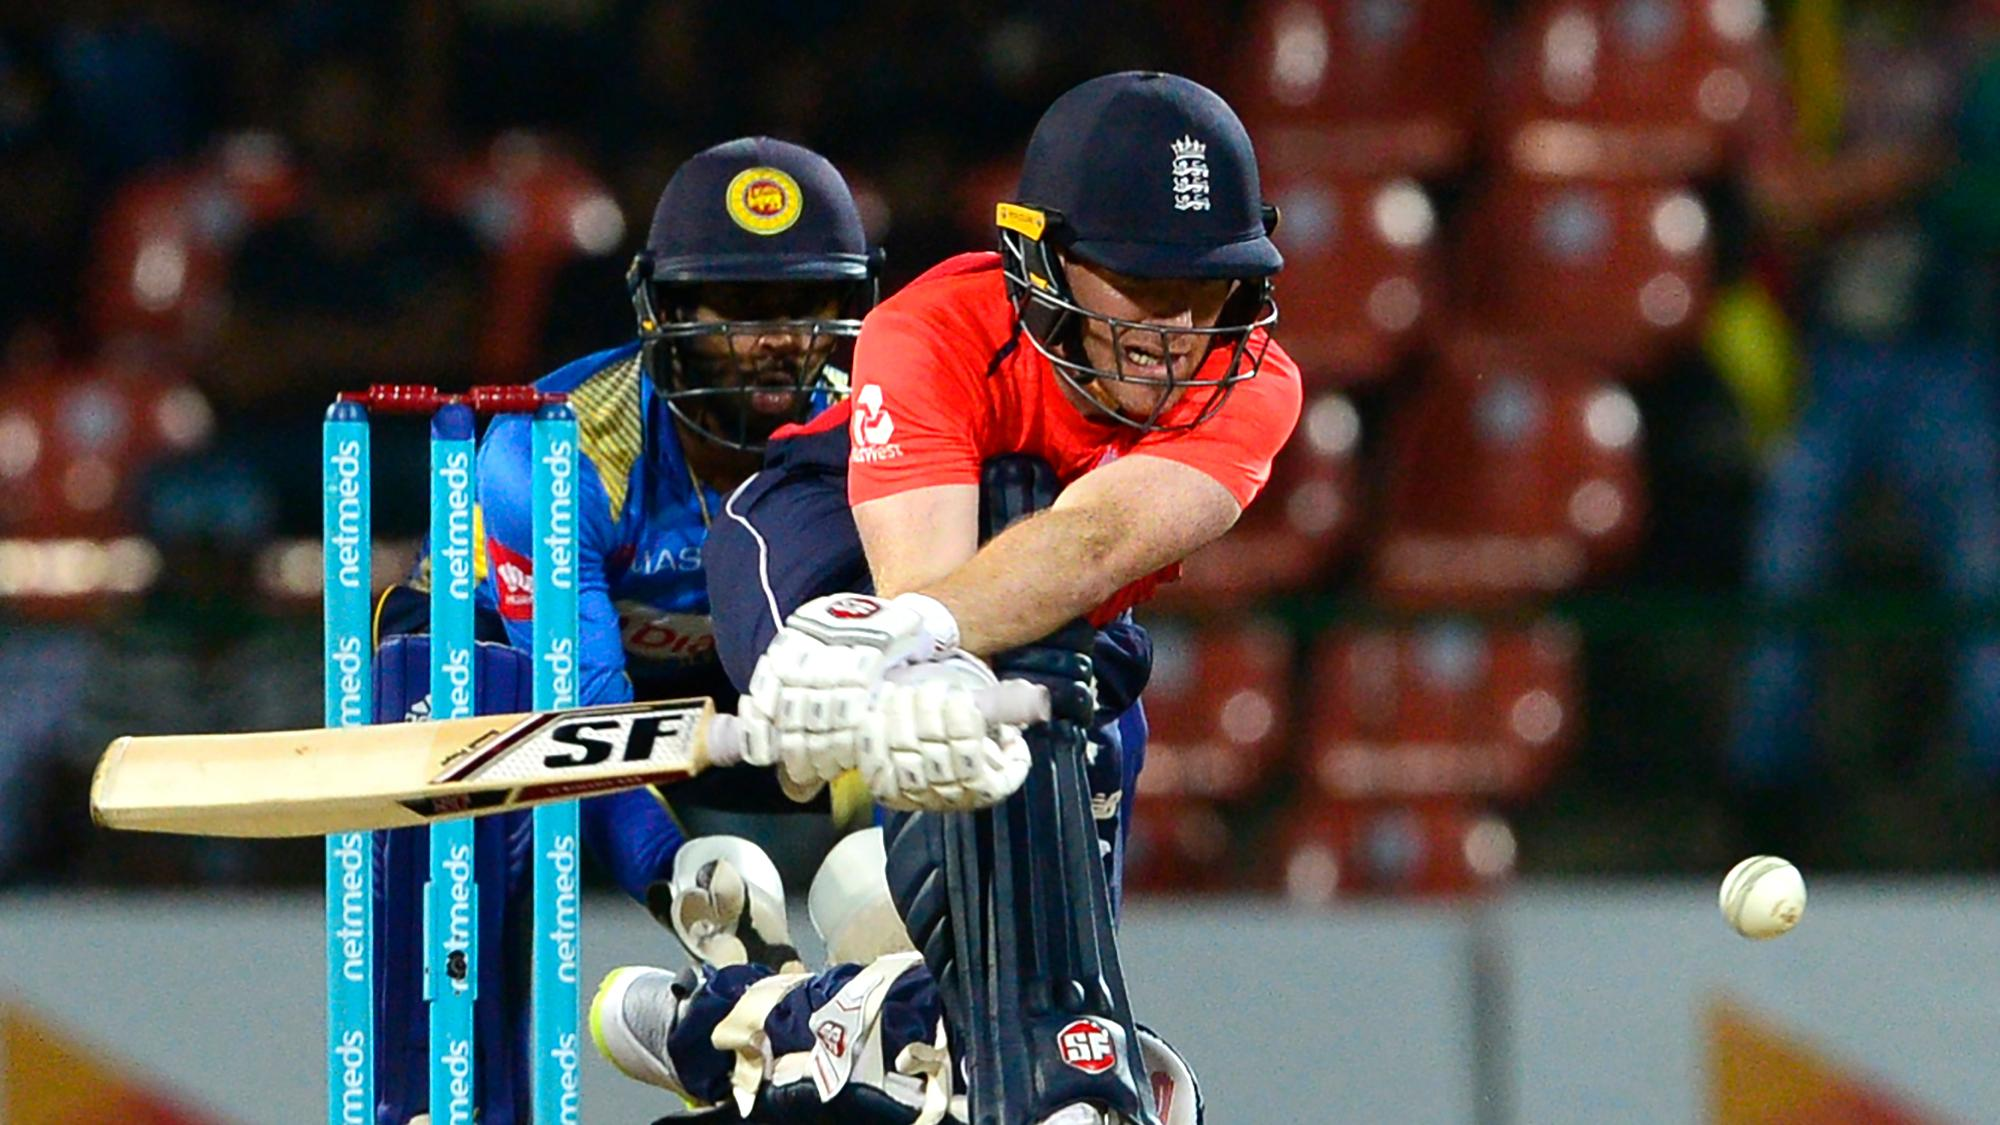 Series surrendered, Sri Lanka seek to salvage pride